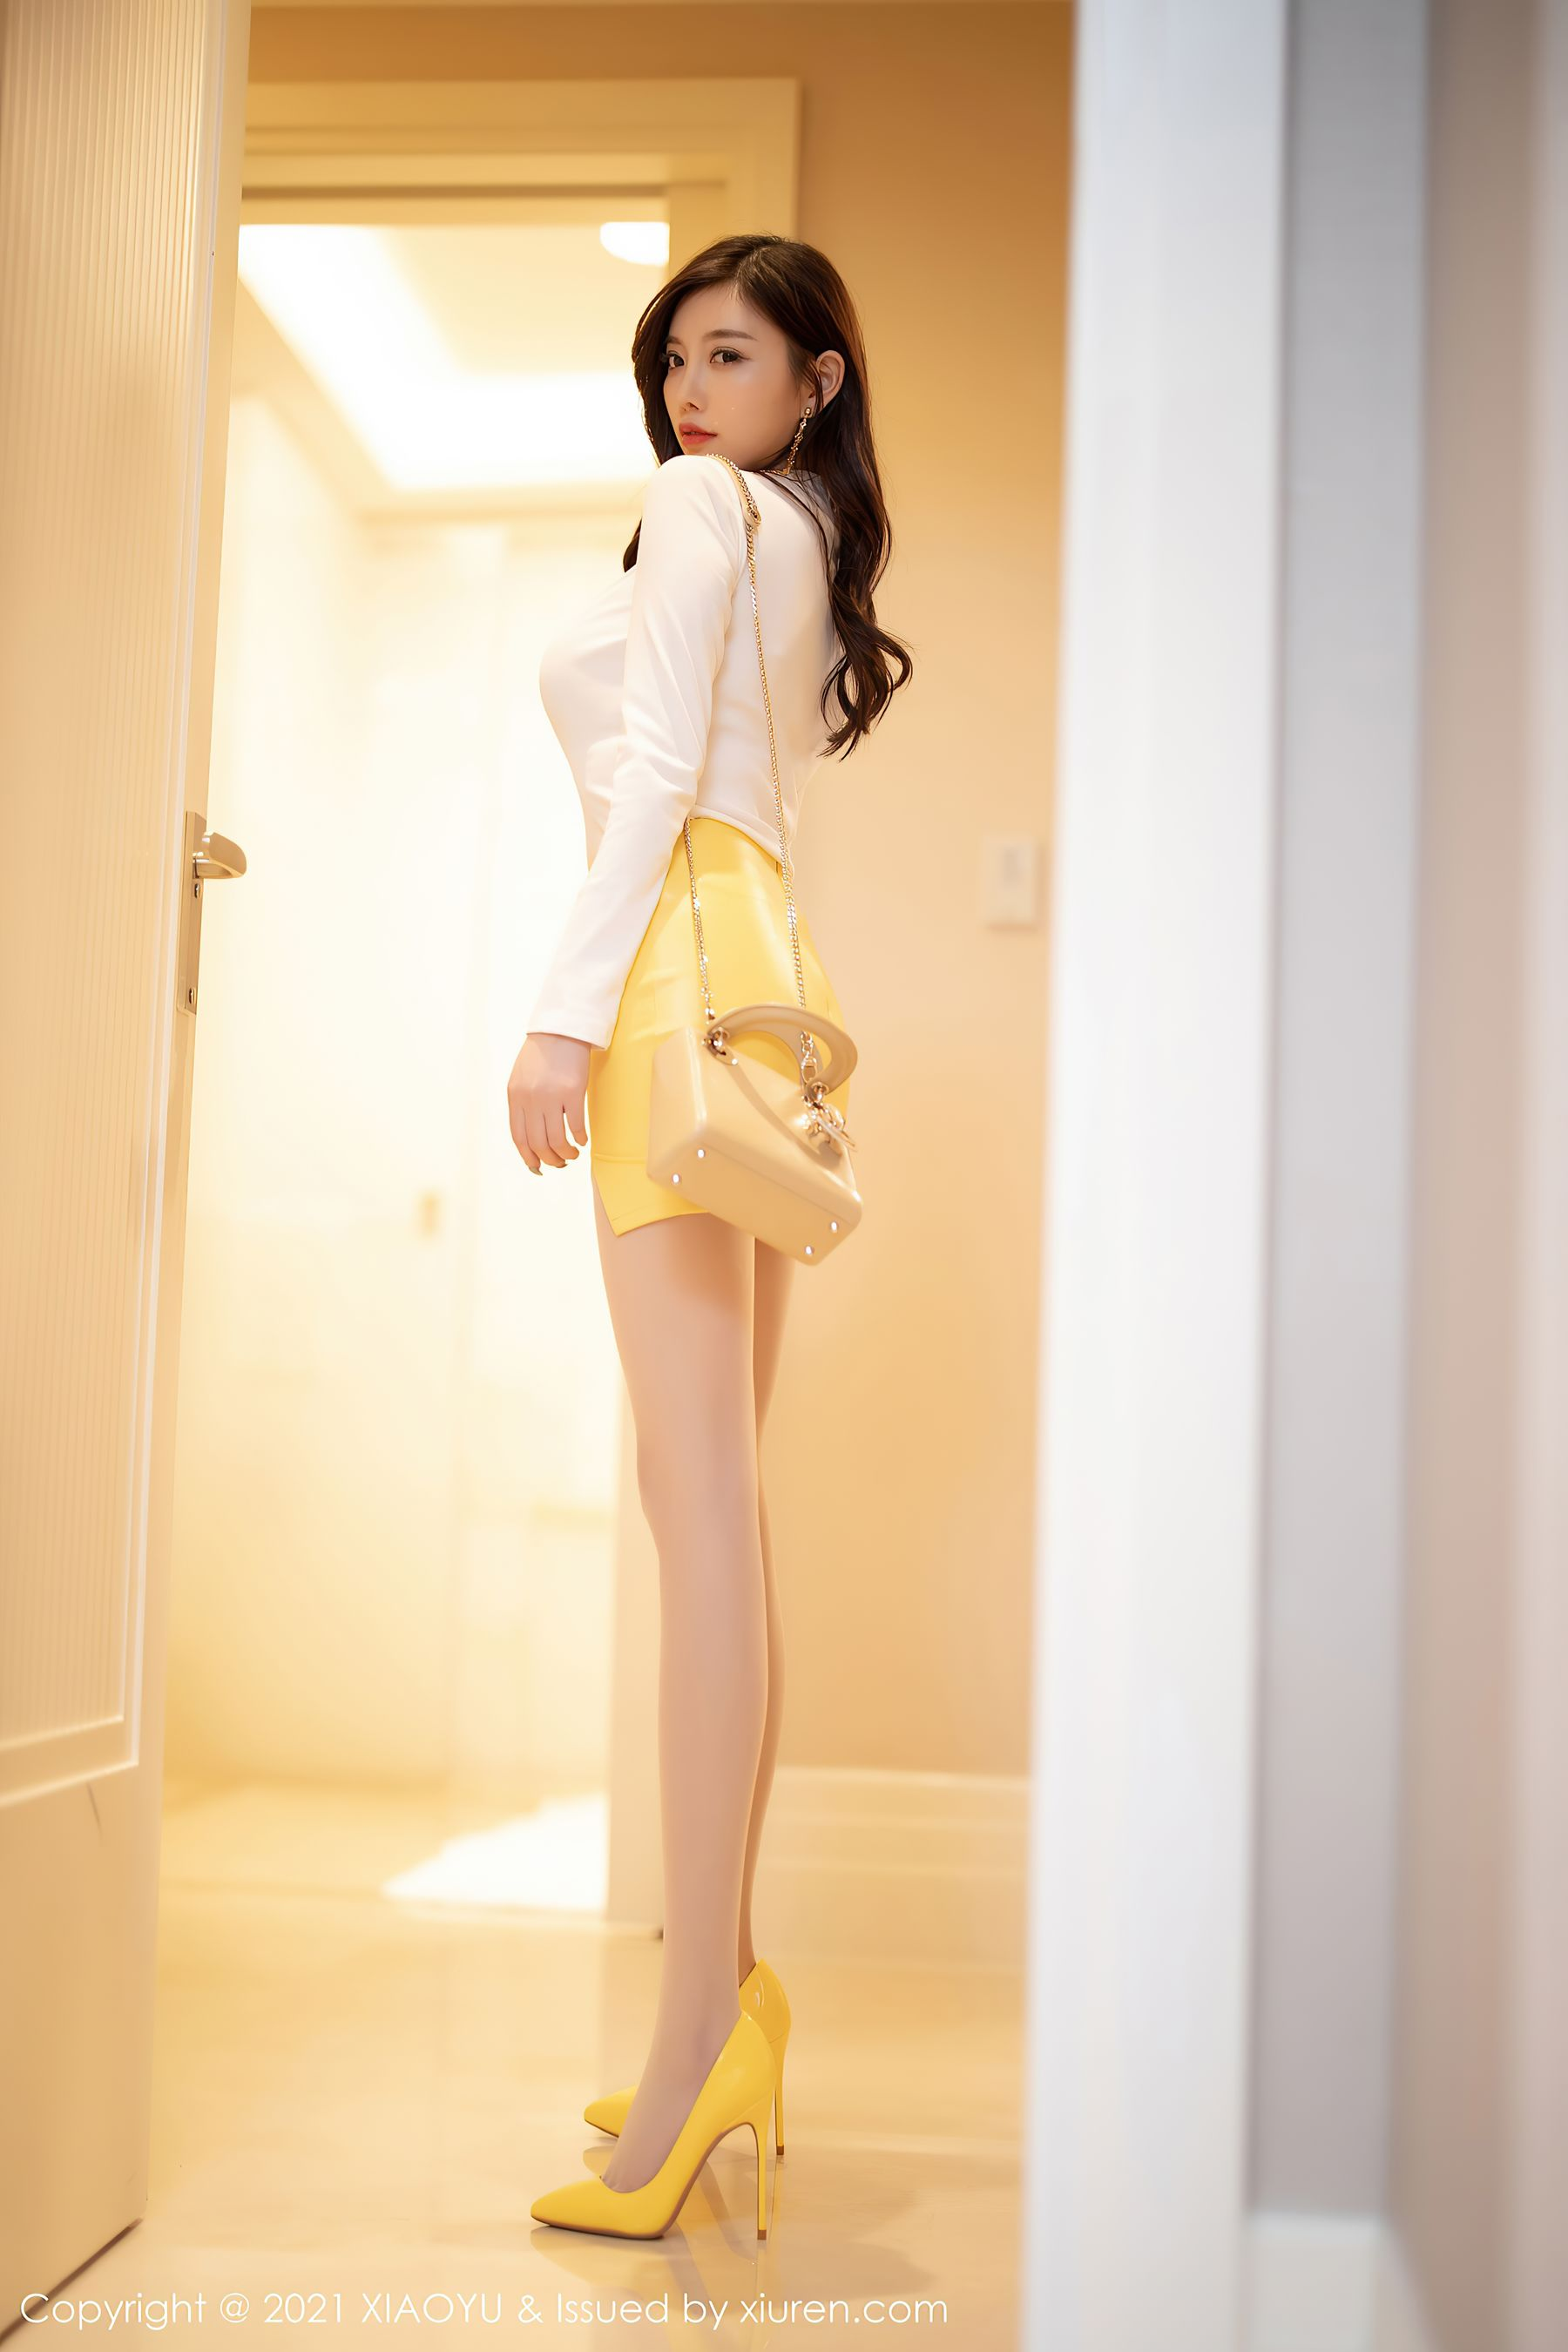 VOL.160 [语画界]美腿性感女郎:杨晨晨(sugar小甜心CC,杨晨晨sugar)超高清写真套图(86P)